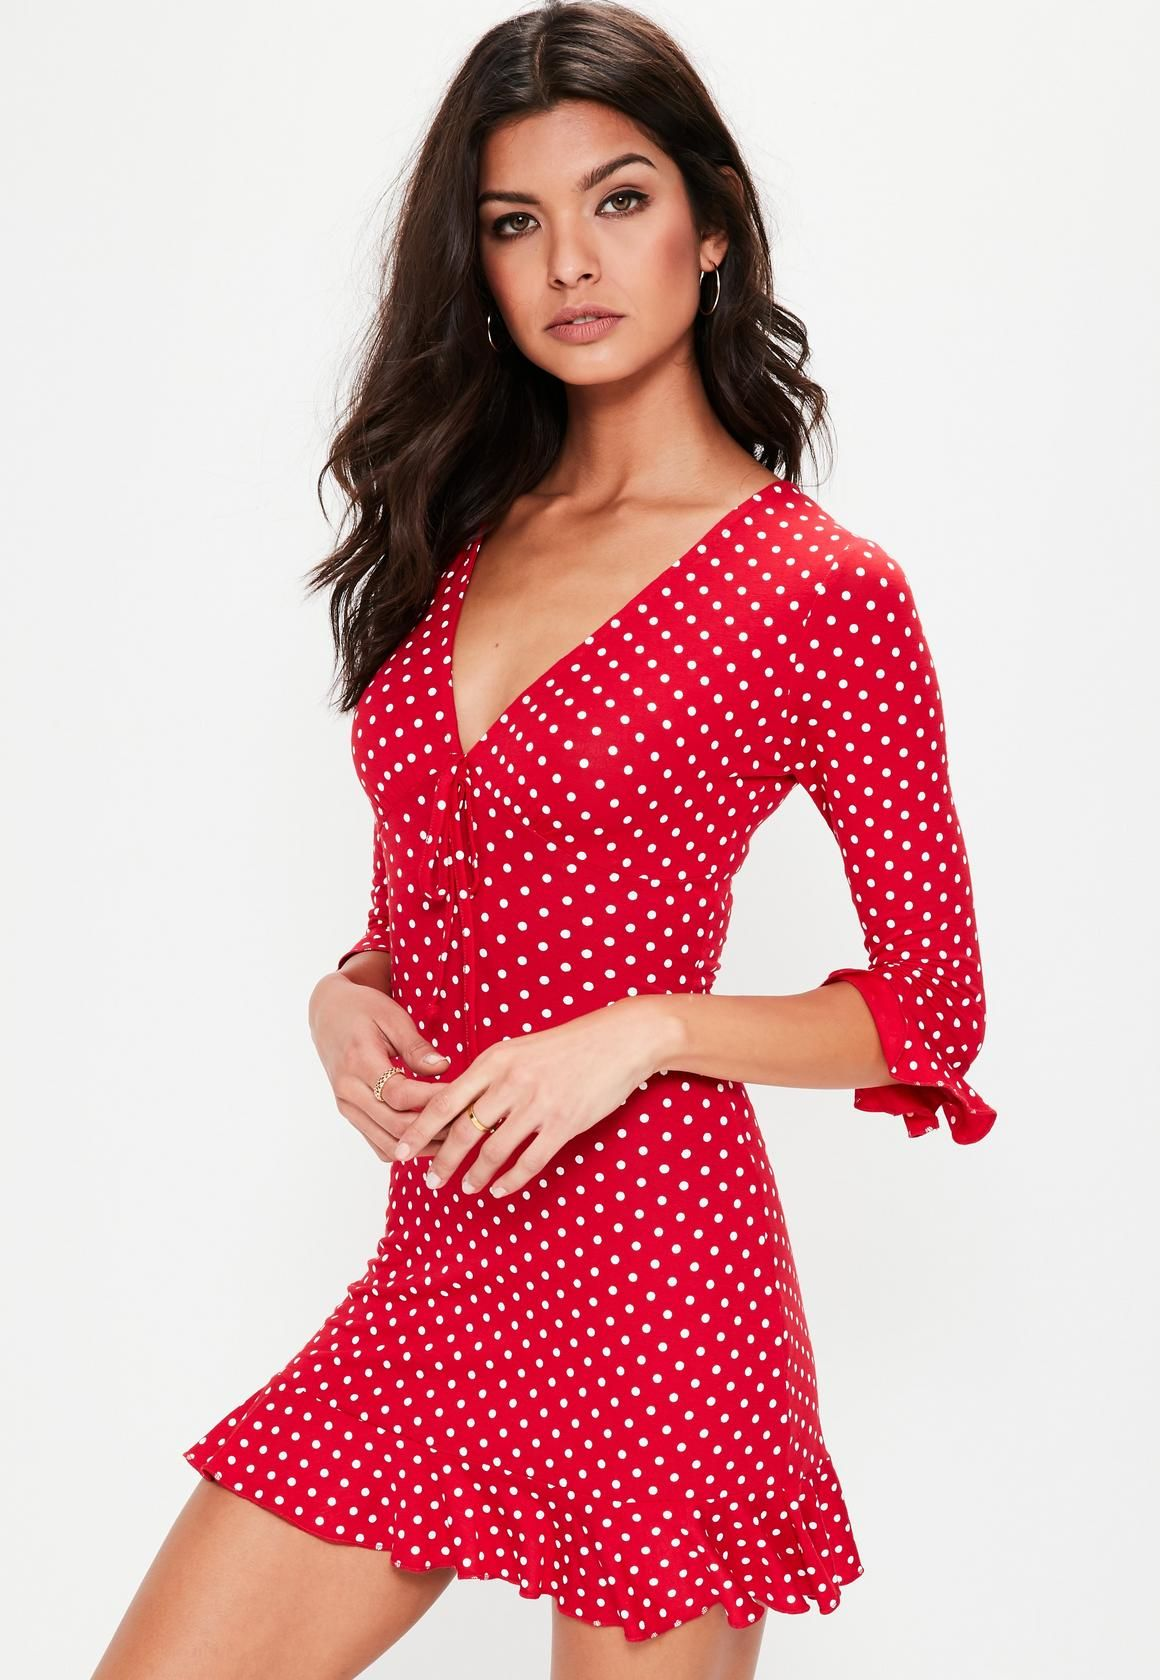 47ea81505592 Missguided - Red Polka Dot Print Frill Bodycon Tea Dress | Fashion ...